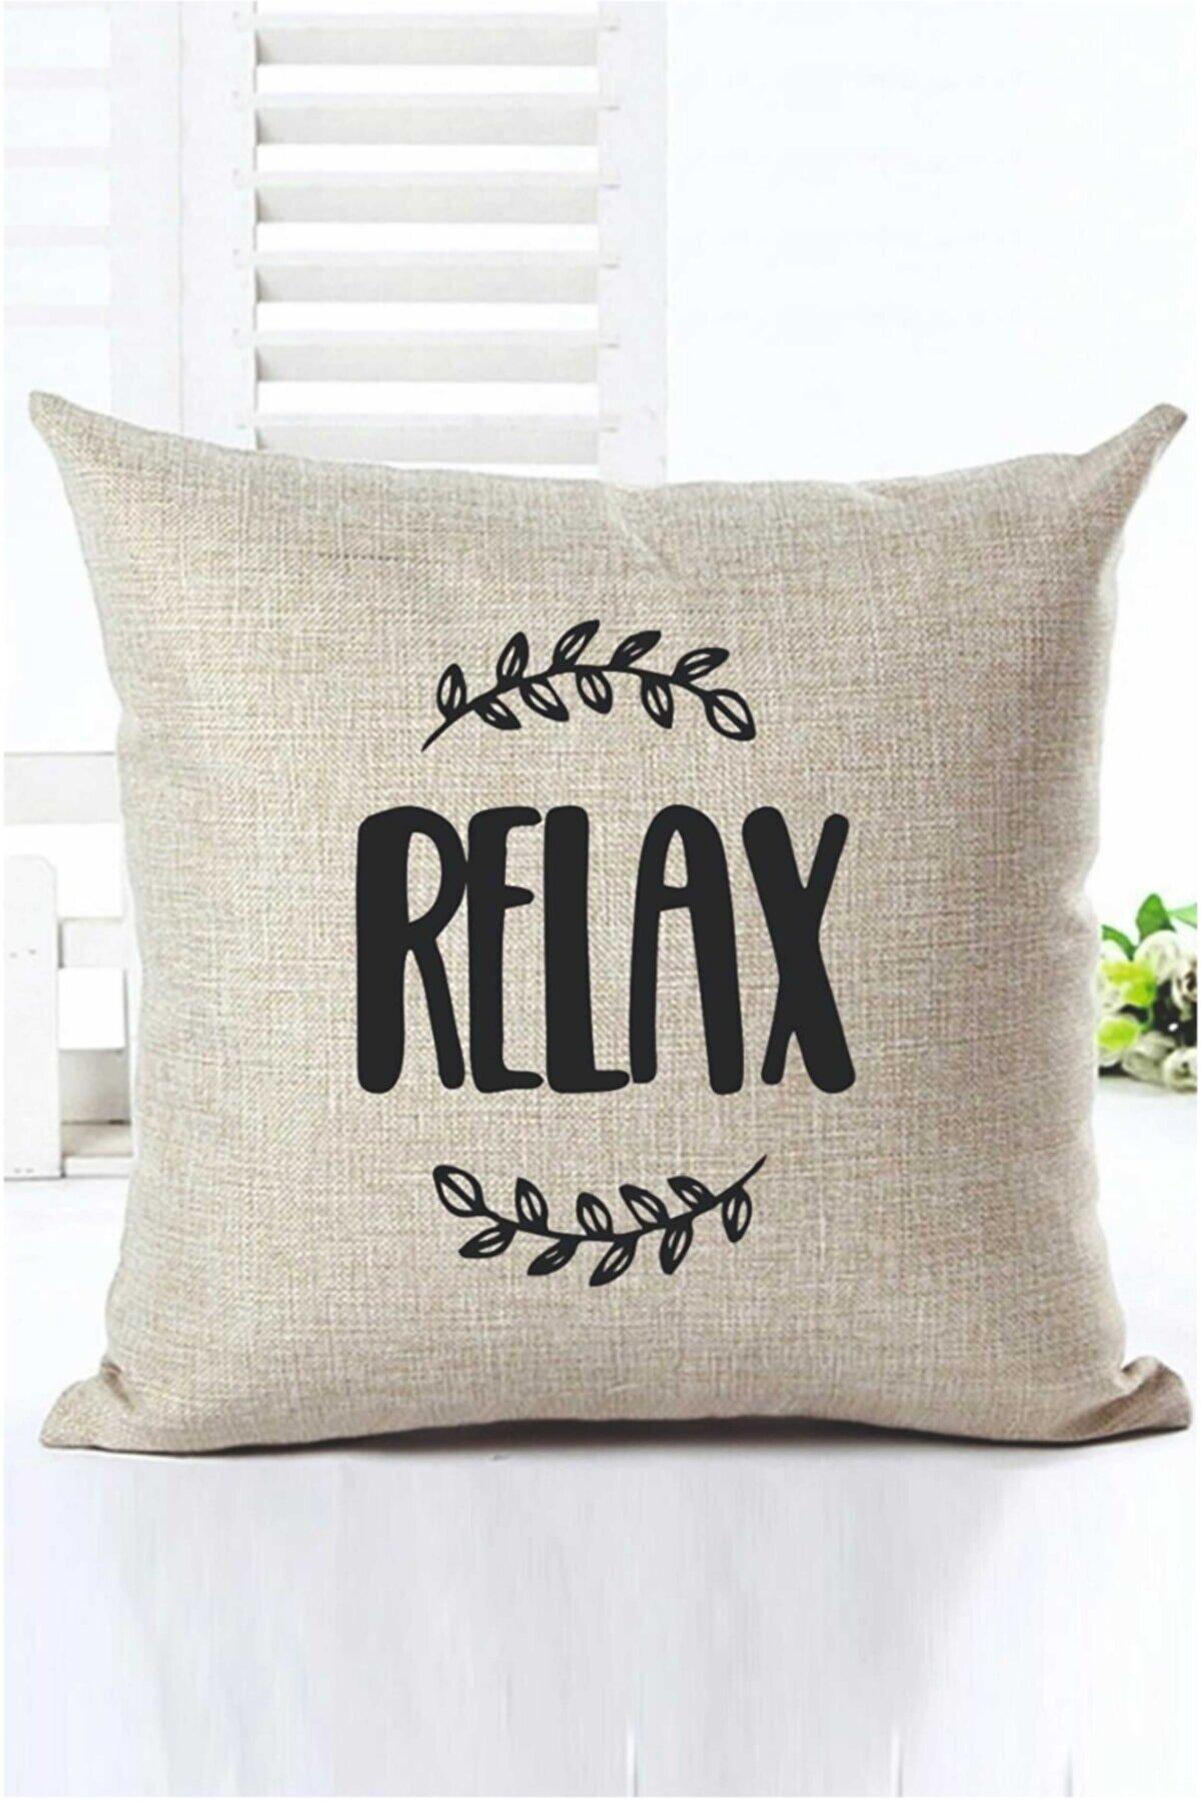 H&E DESIGN Relax Desenli Dekoratif Kırlent Kılıfı Kr00010